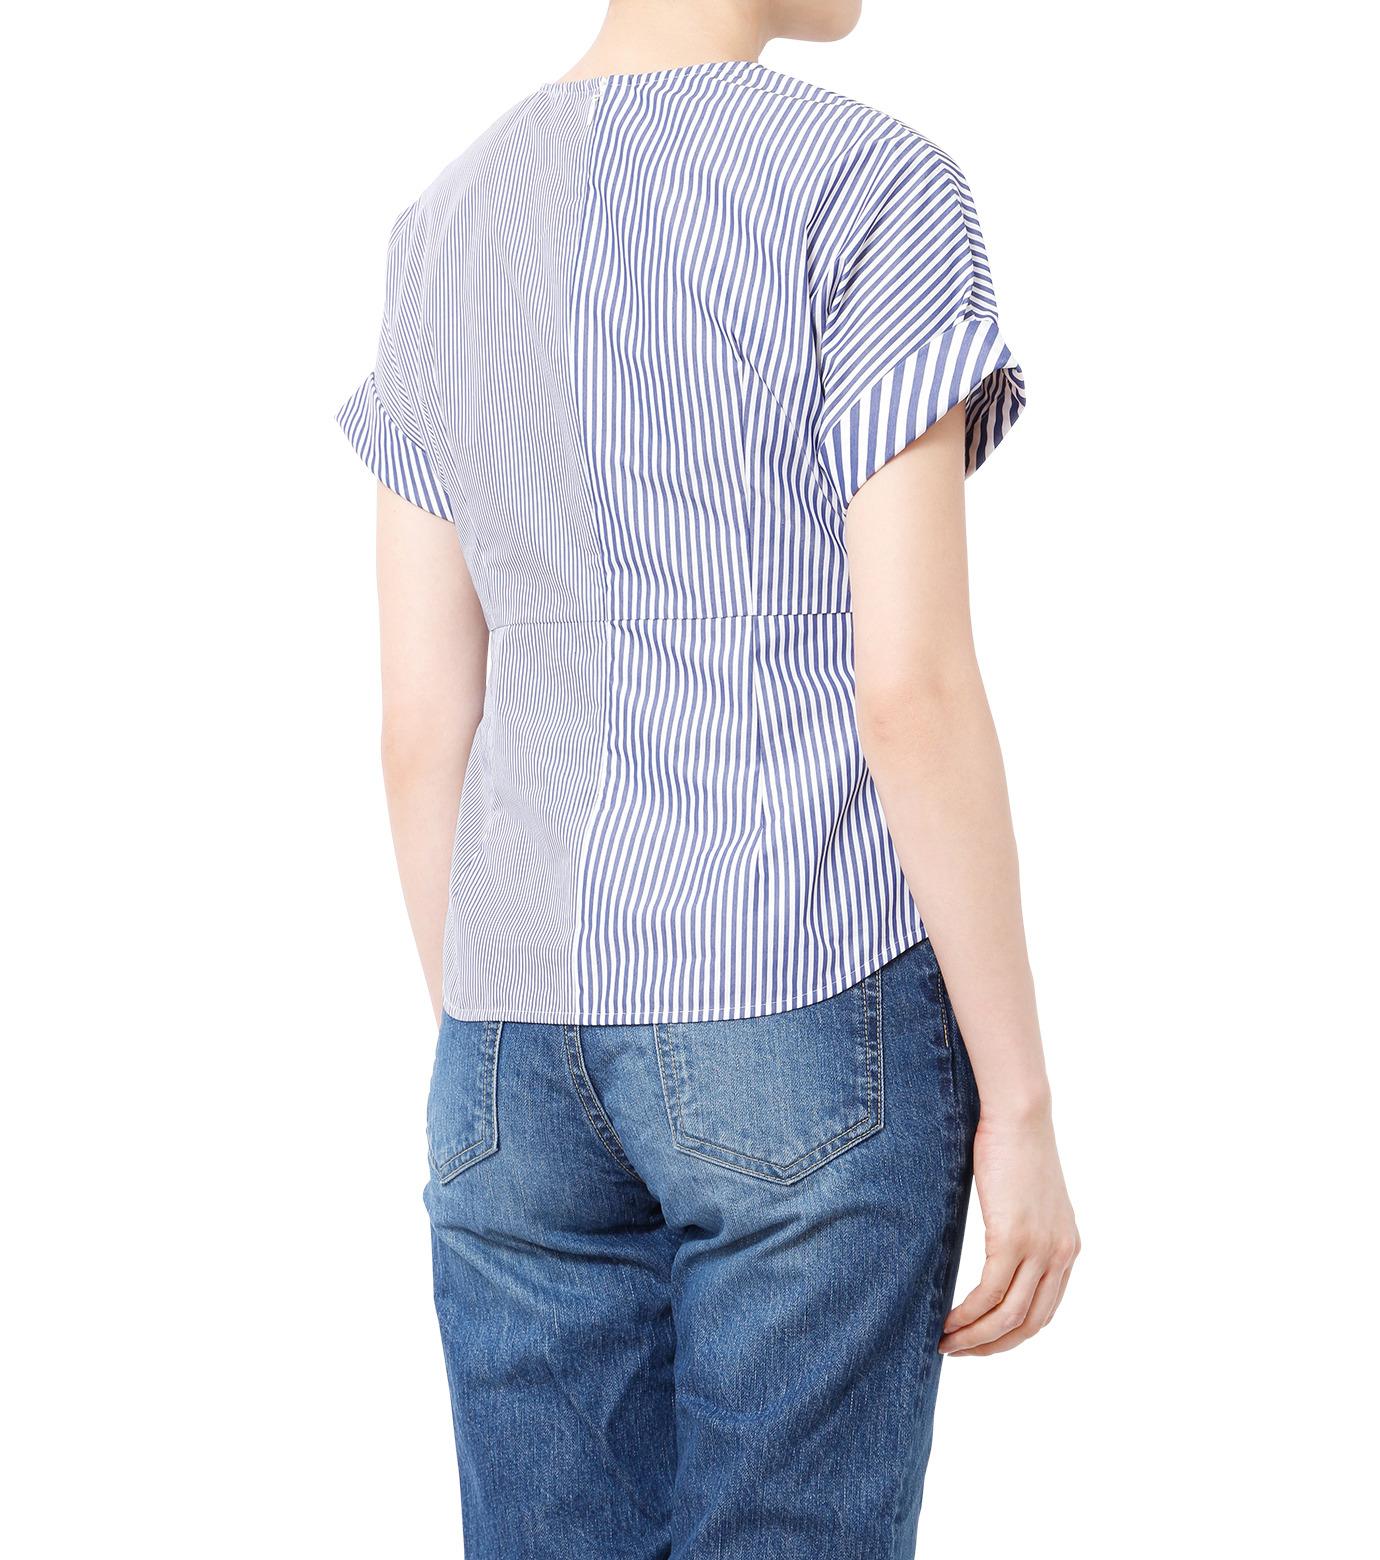 LE CIEL BLEU(ルシェルブルー)のストライプツイストトップス-MULTI COLOUR(シャツ/shirt)-18A63313 拡大詳細画像2